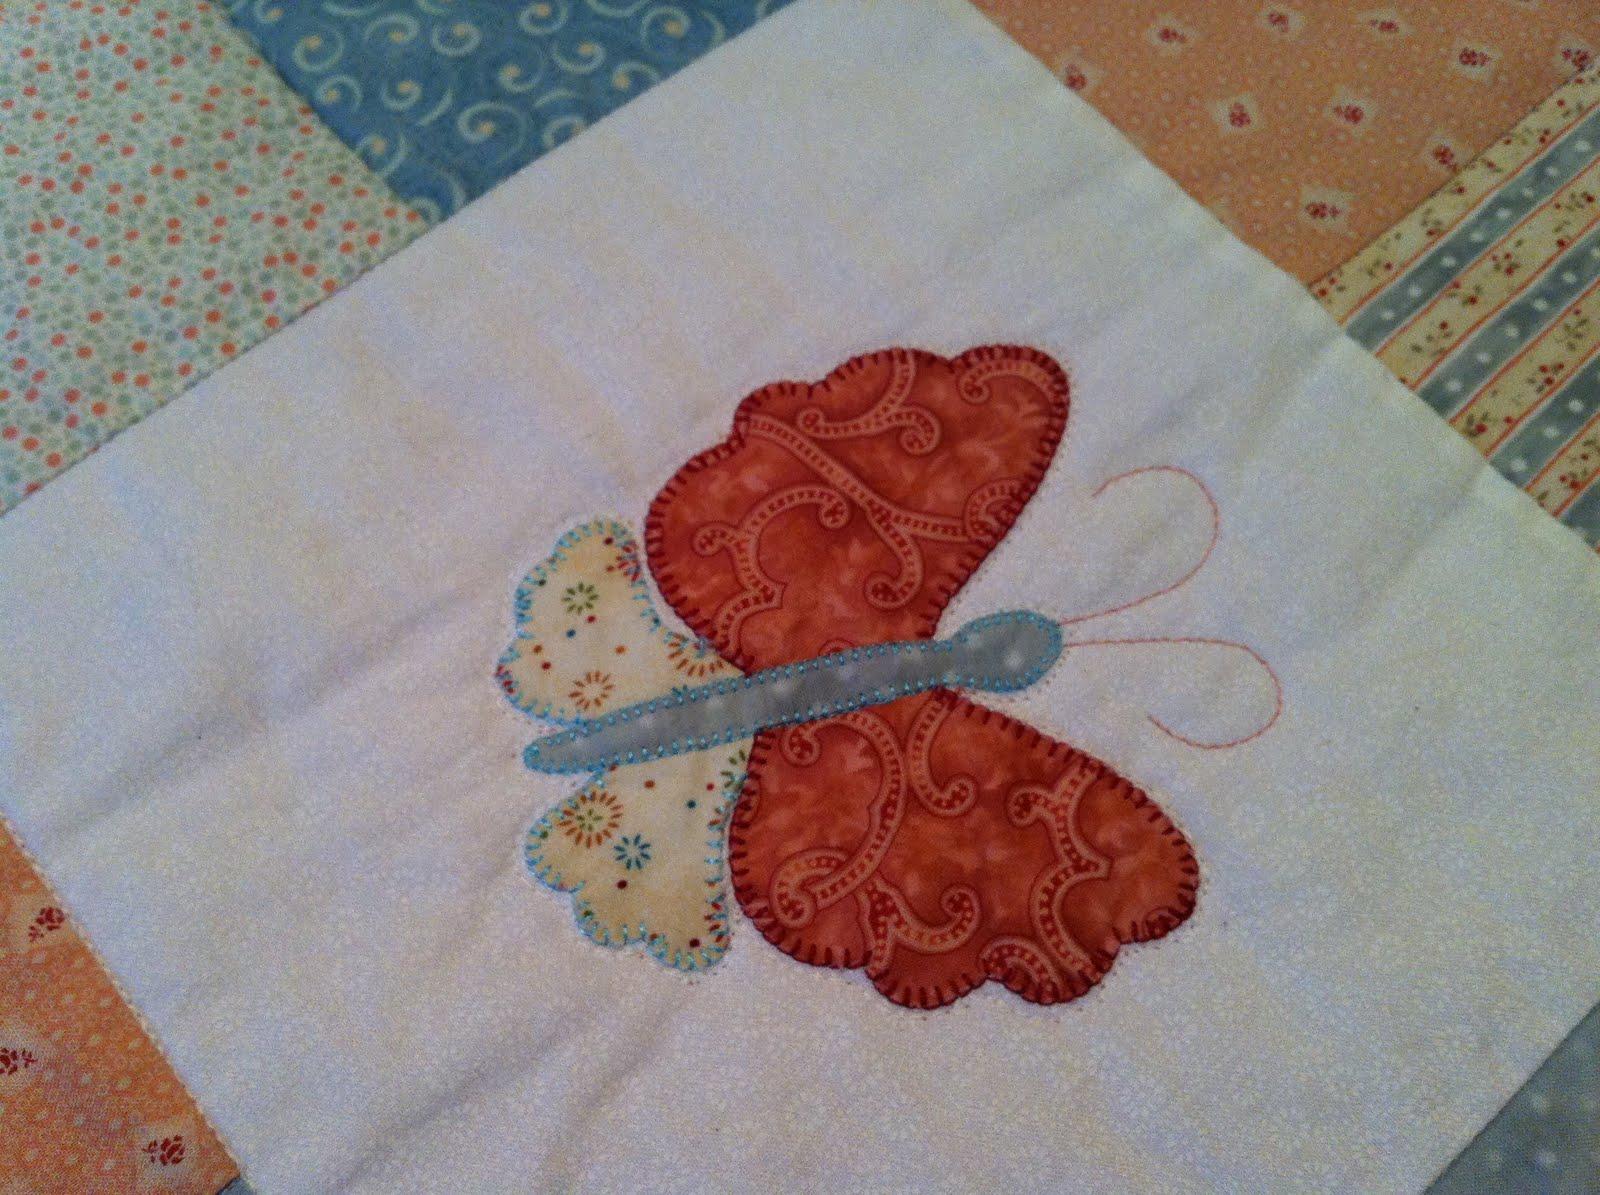 Mi hobby patchwork colcha de mariposas de paula - Hacer una colcha de patchwork ...